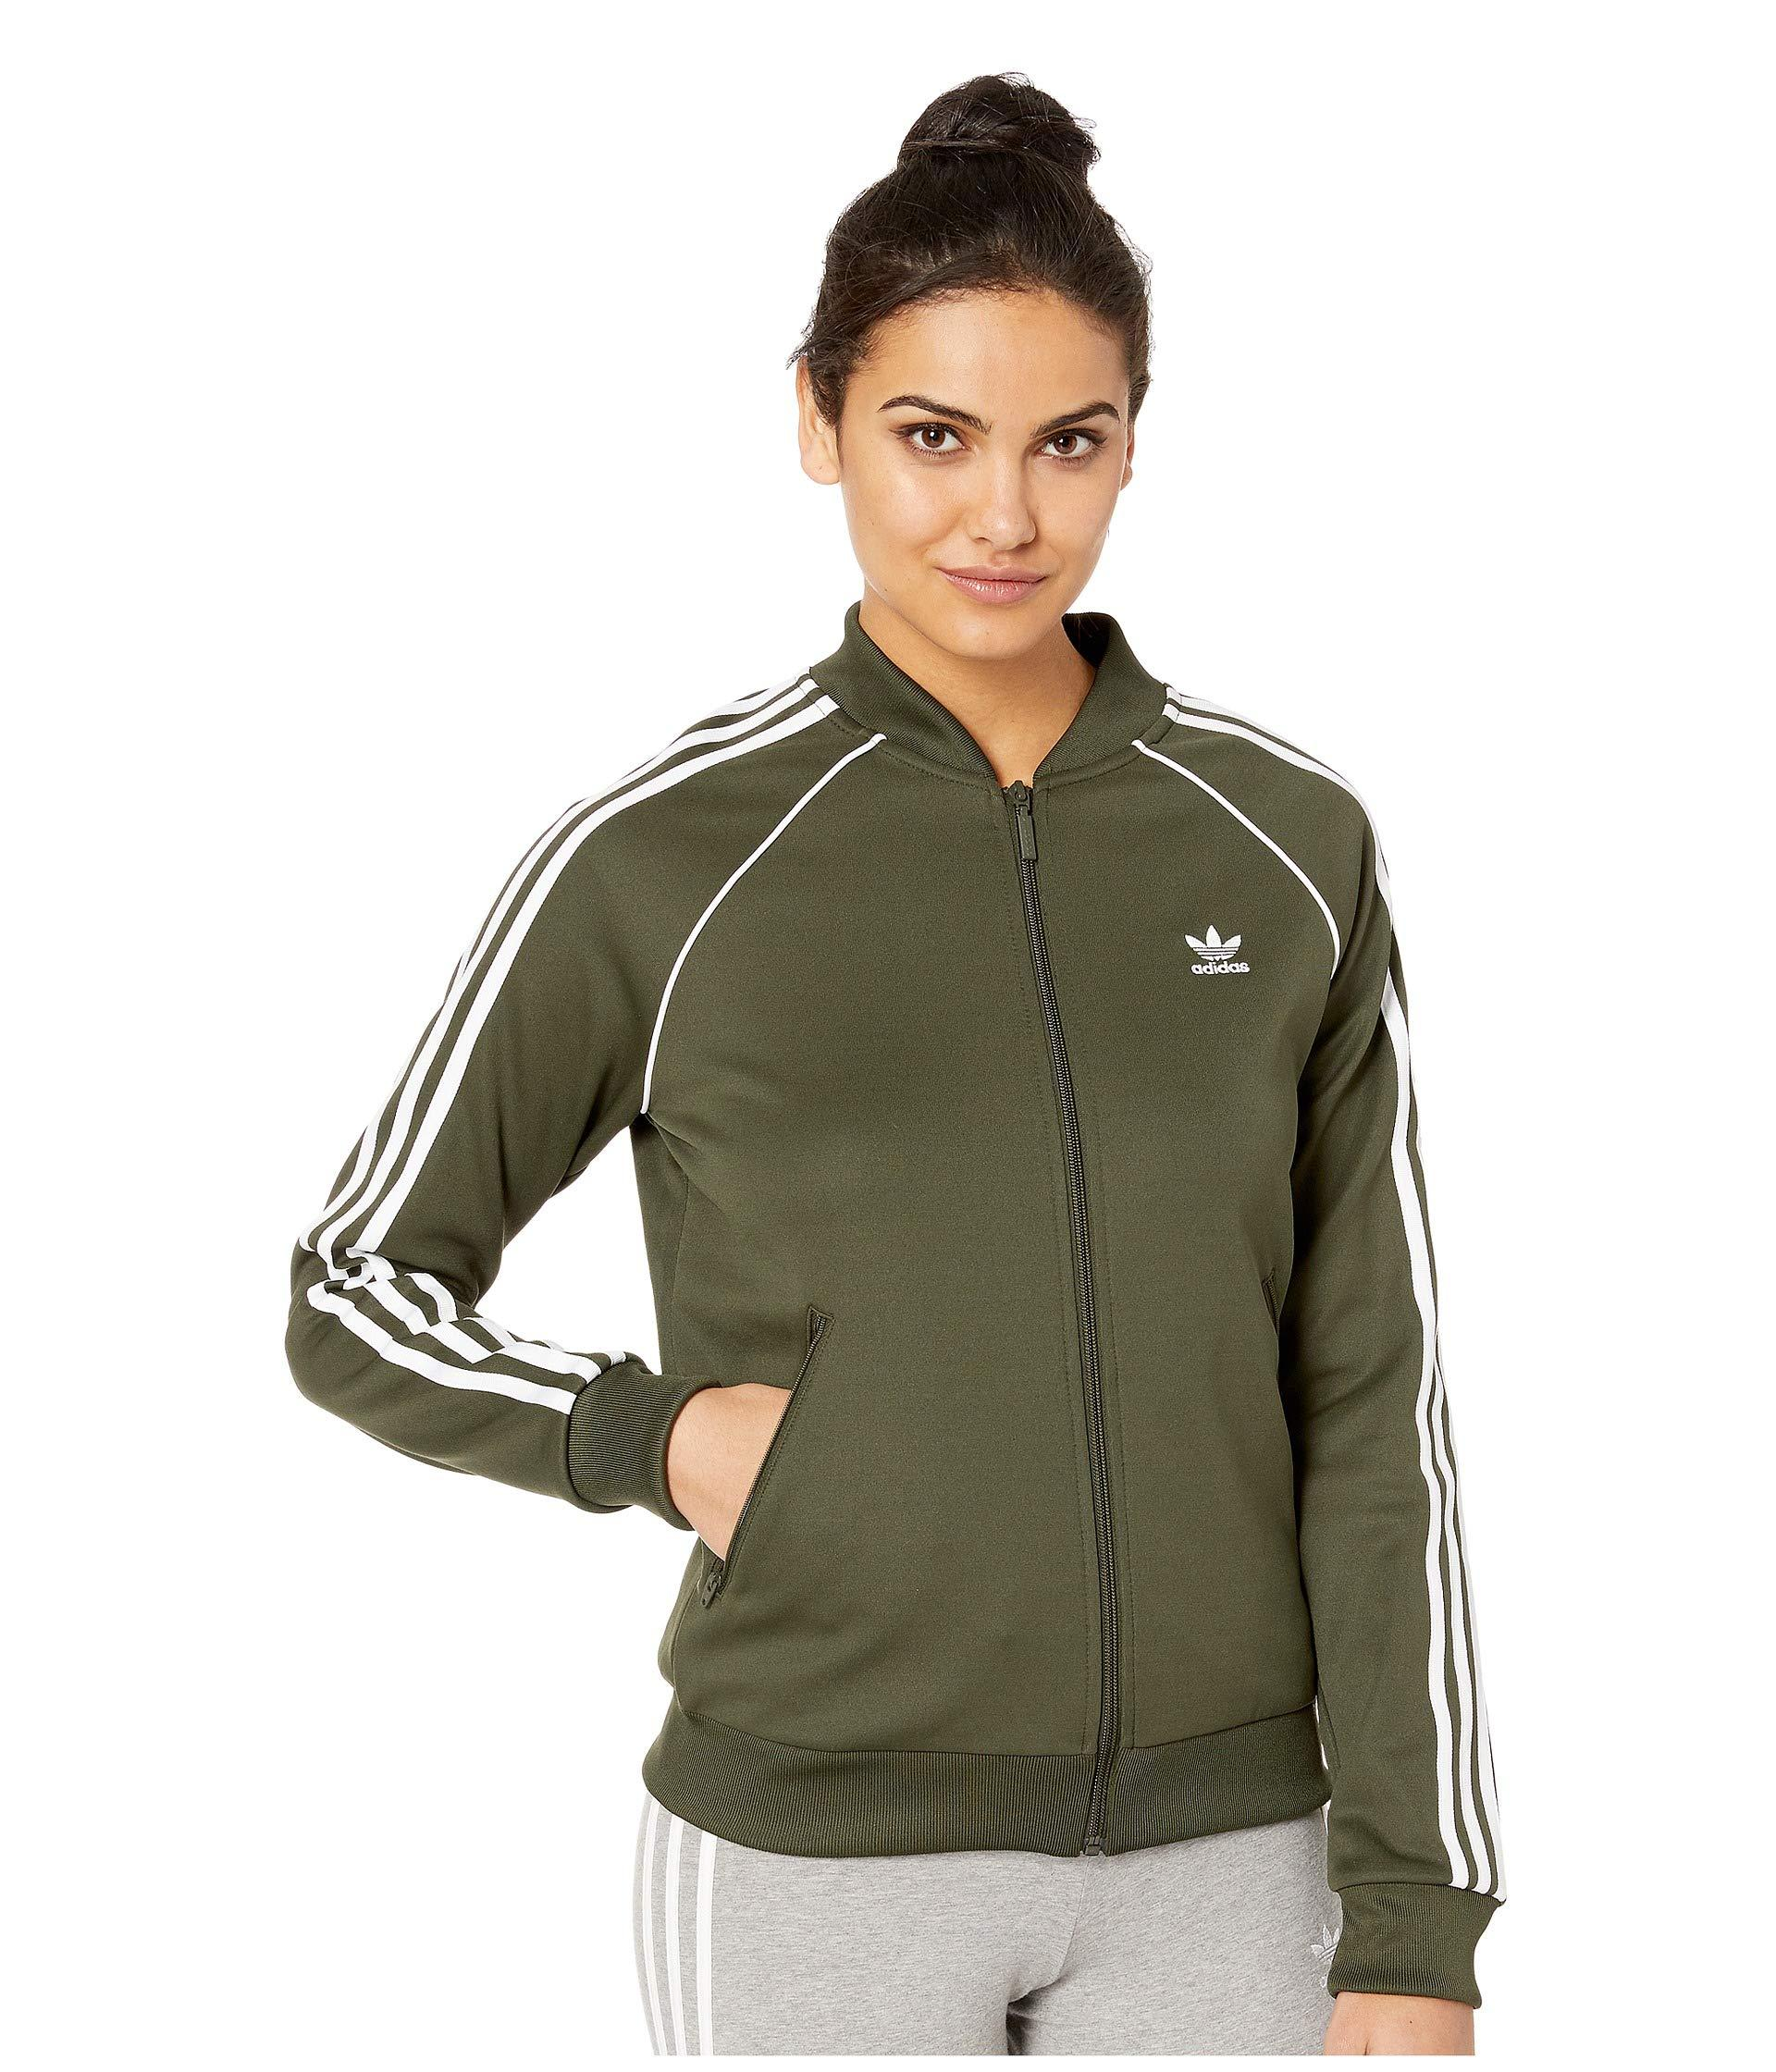 973c01d7f0 Green Sst Track Jacket (multicolor 2) Women's Coat